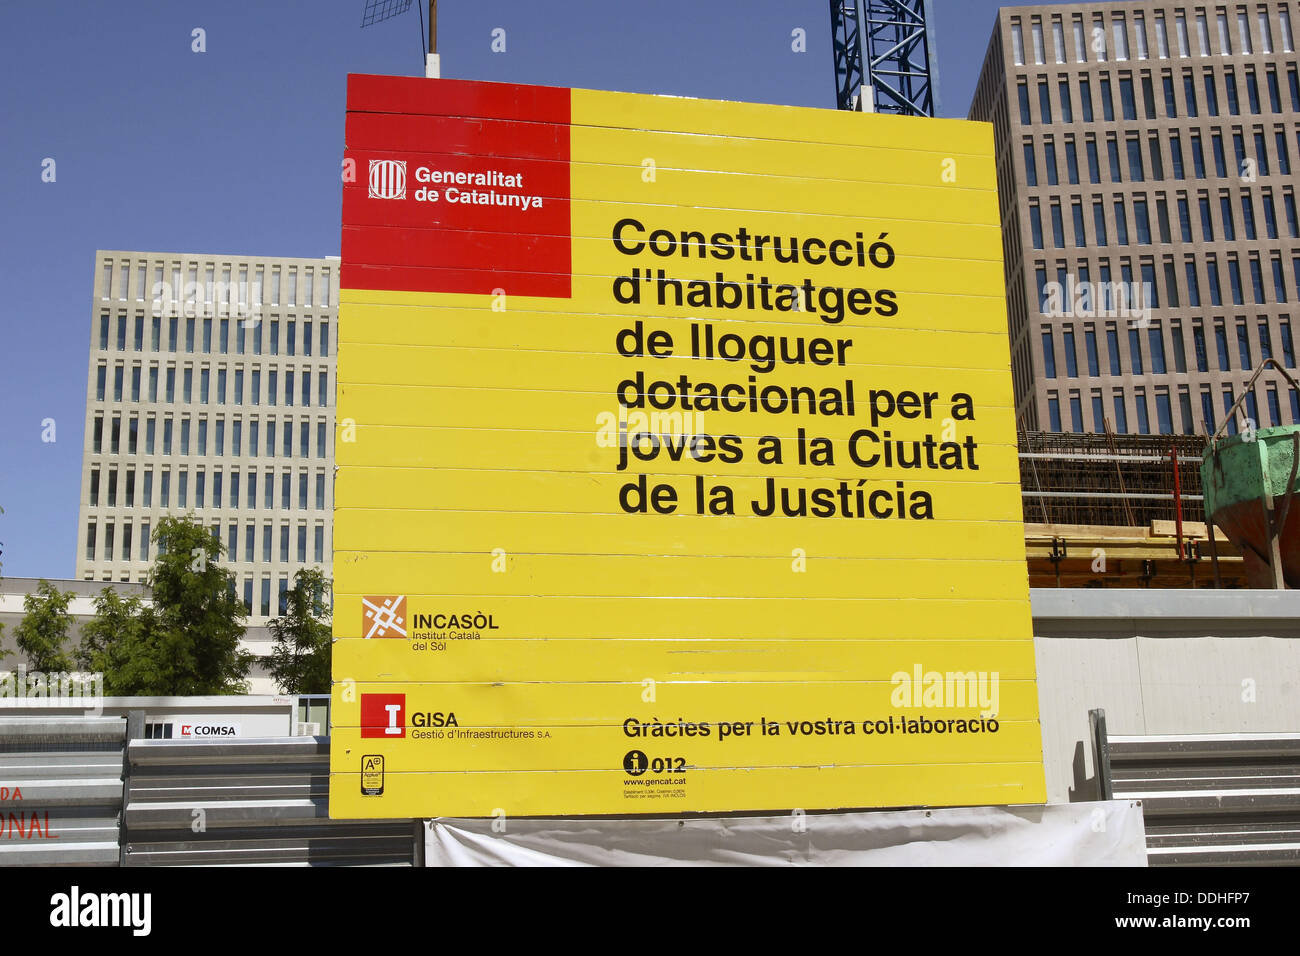 Rental housing under construction sign, Ciutat de la Justicia, Barcelona, Catalonia, Spain Stock Photo